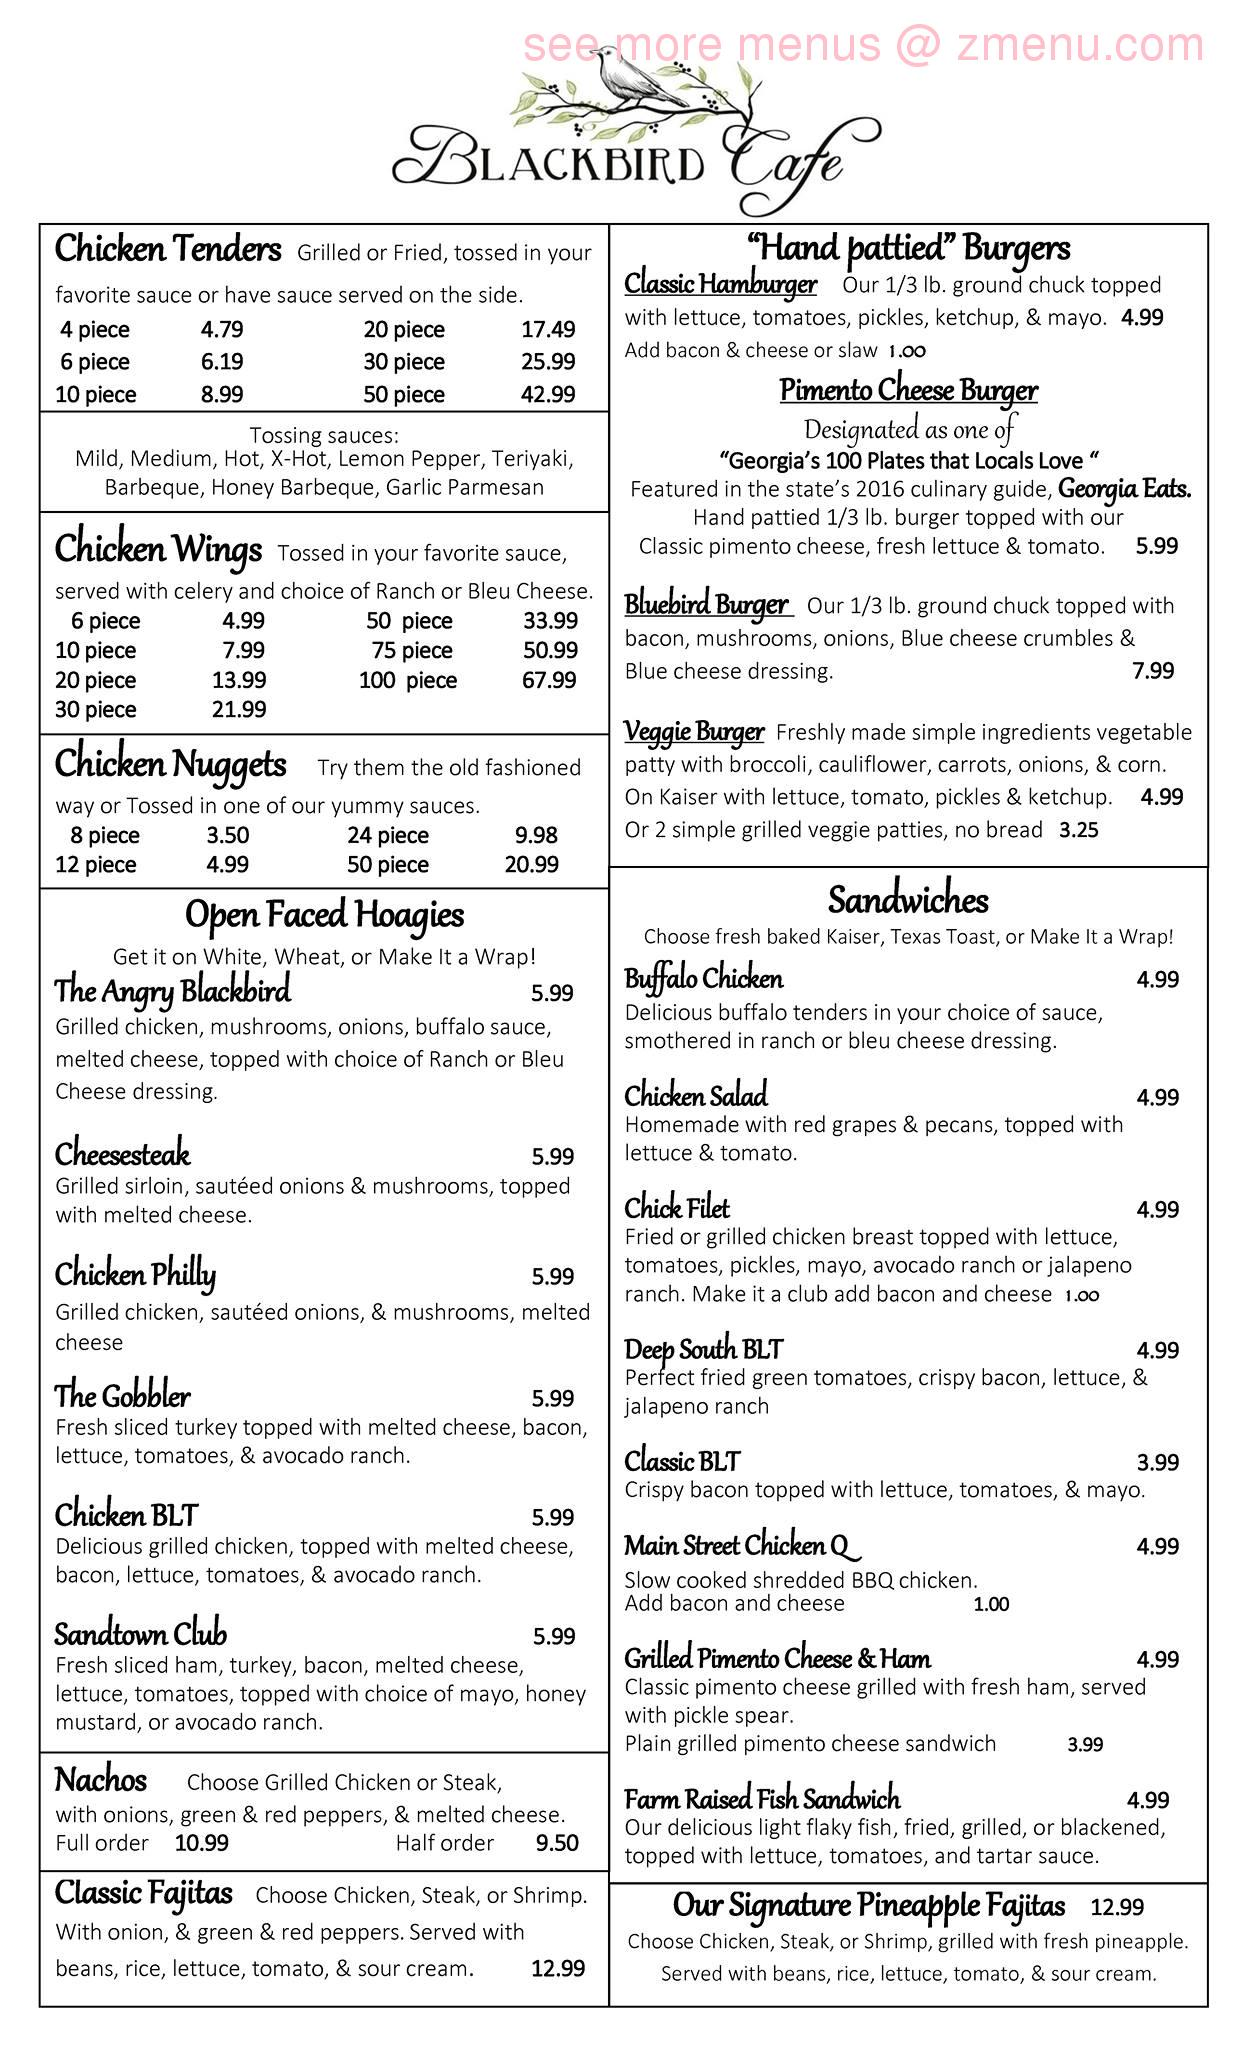 Blackbird Cafe Hours